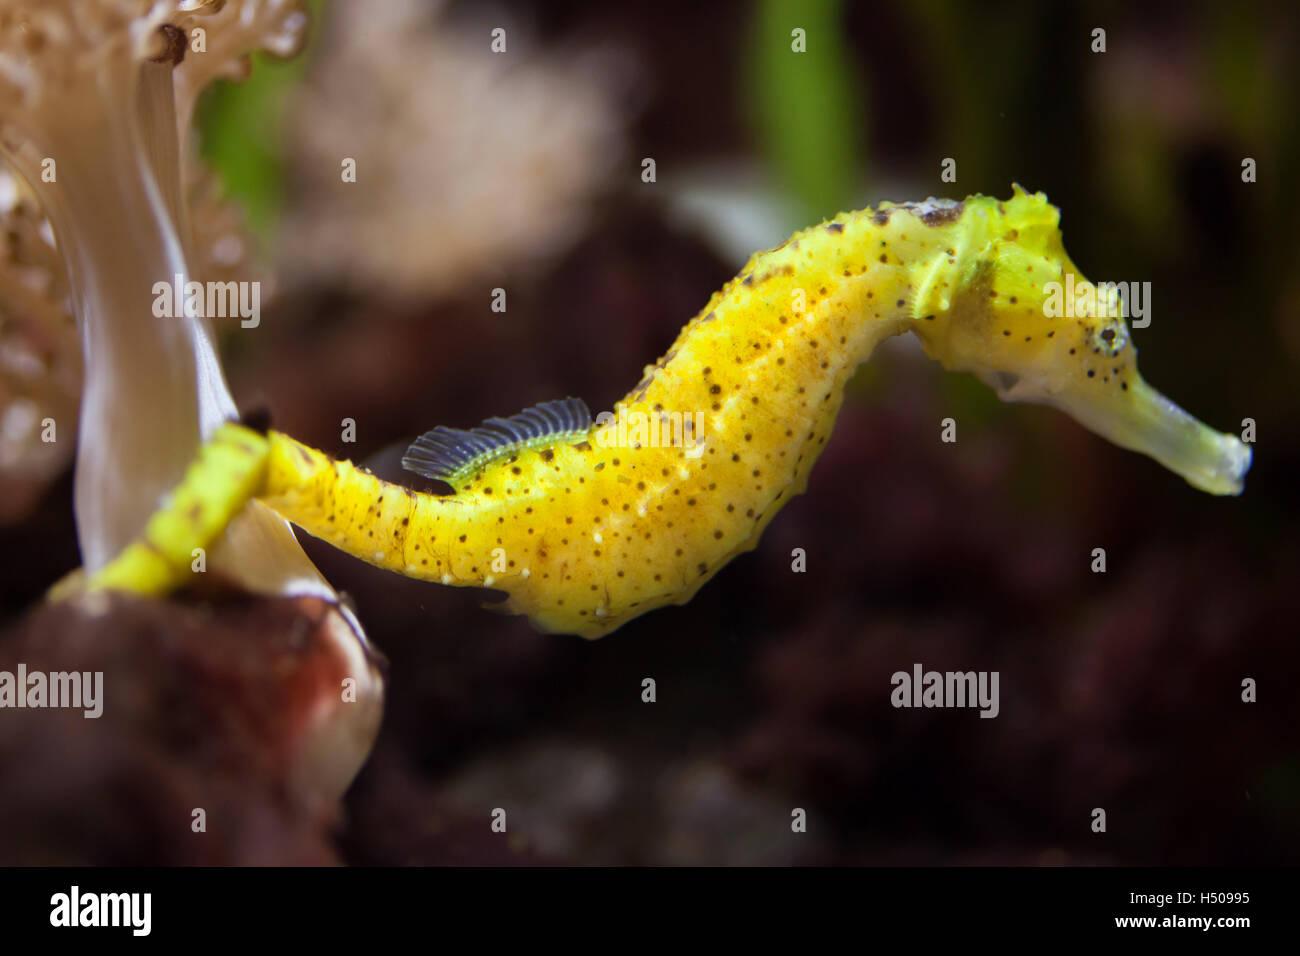 Slender seahorse (Hippocampus reidi), also known as the longsnout seahorse. Wildlife animal. - Stock Image